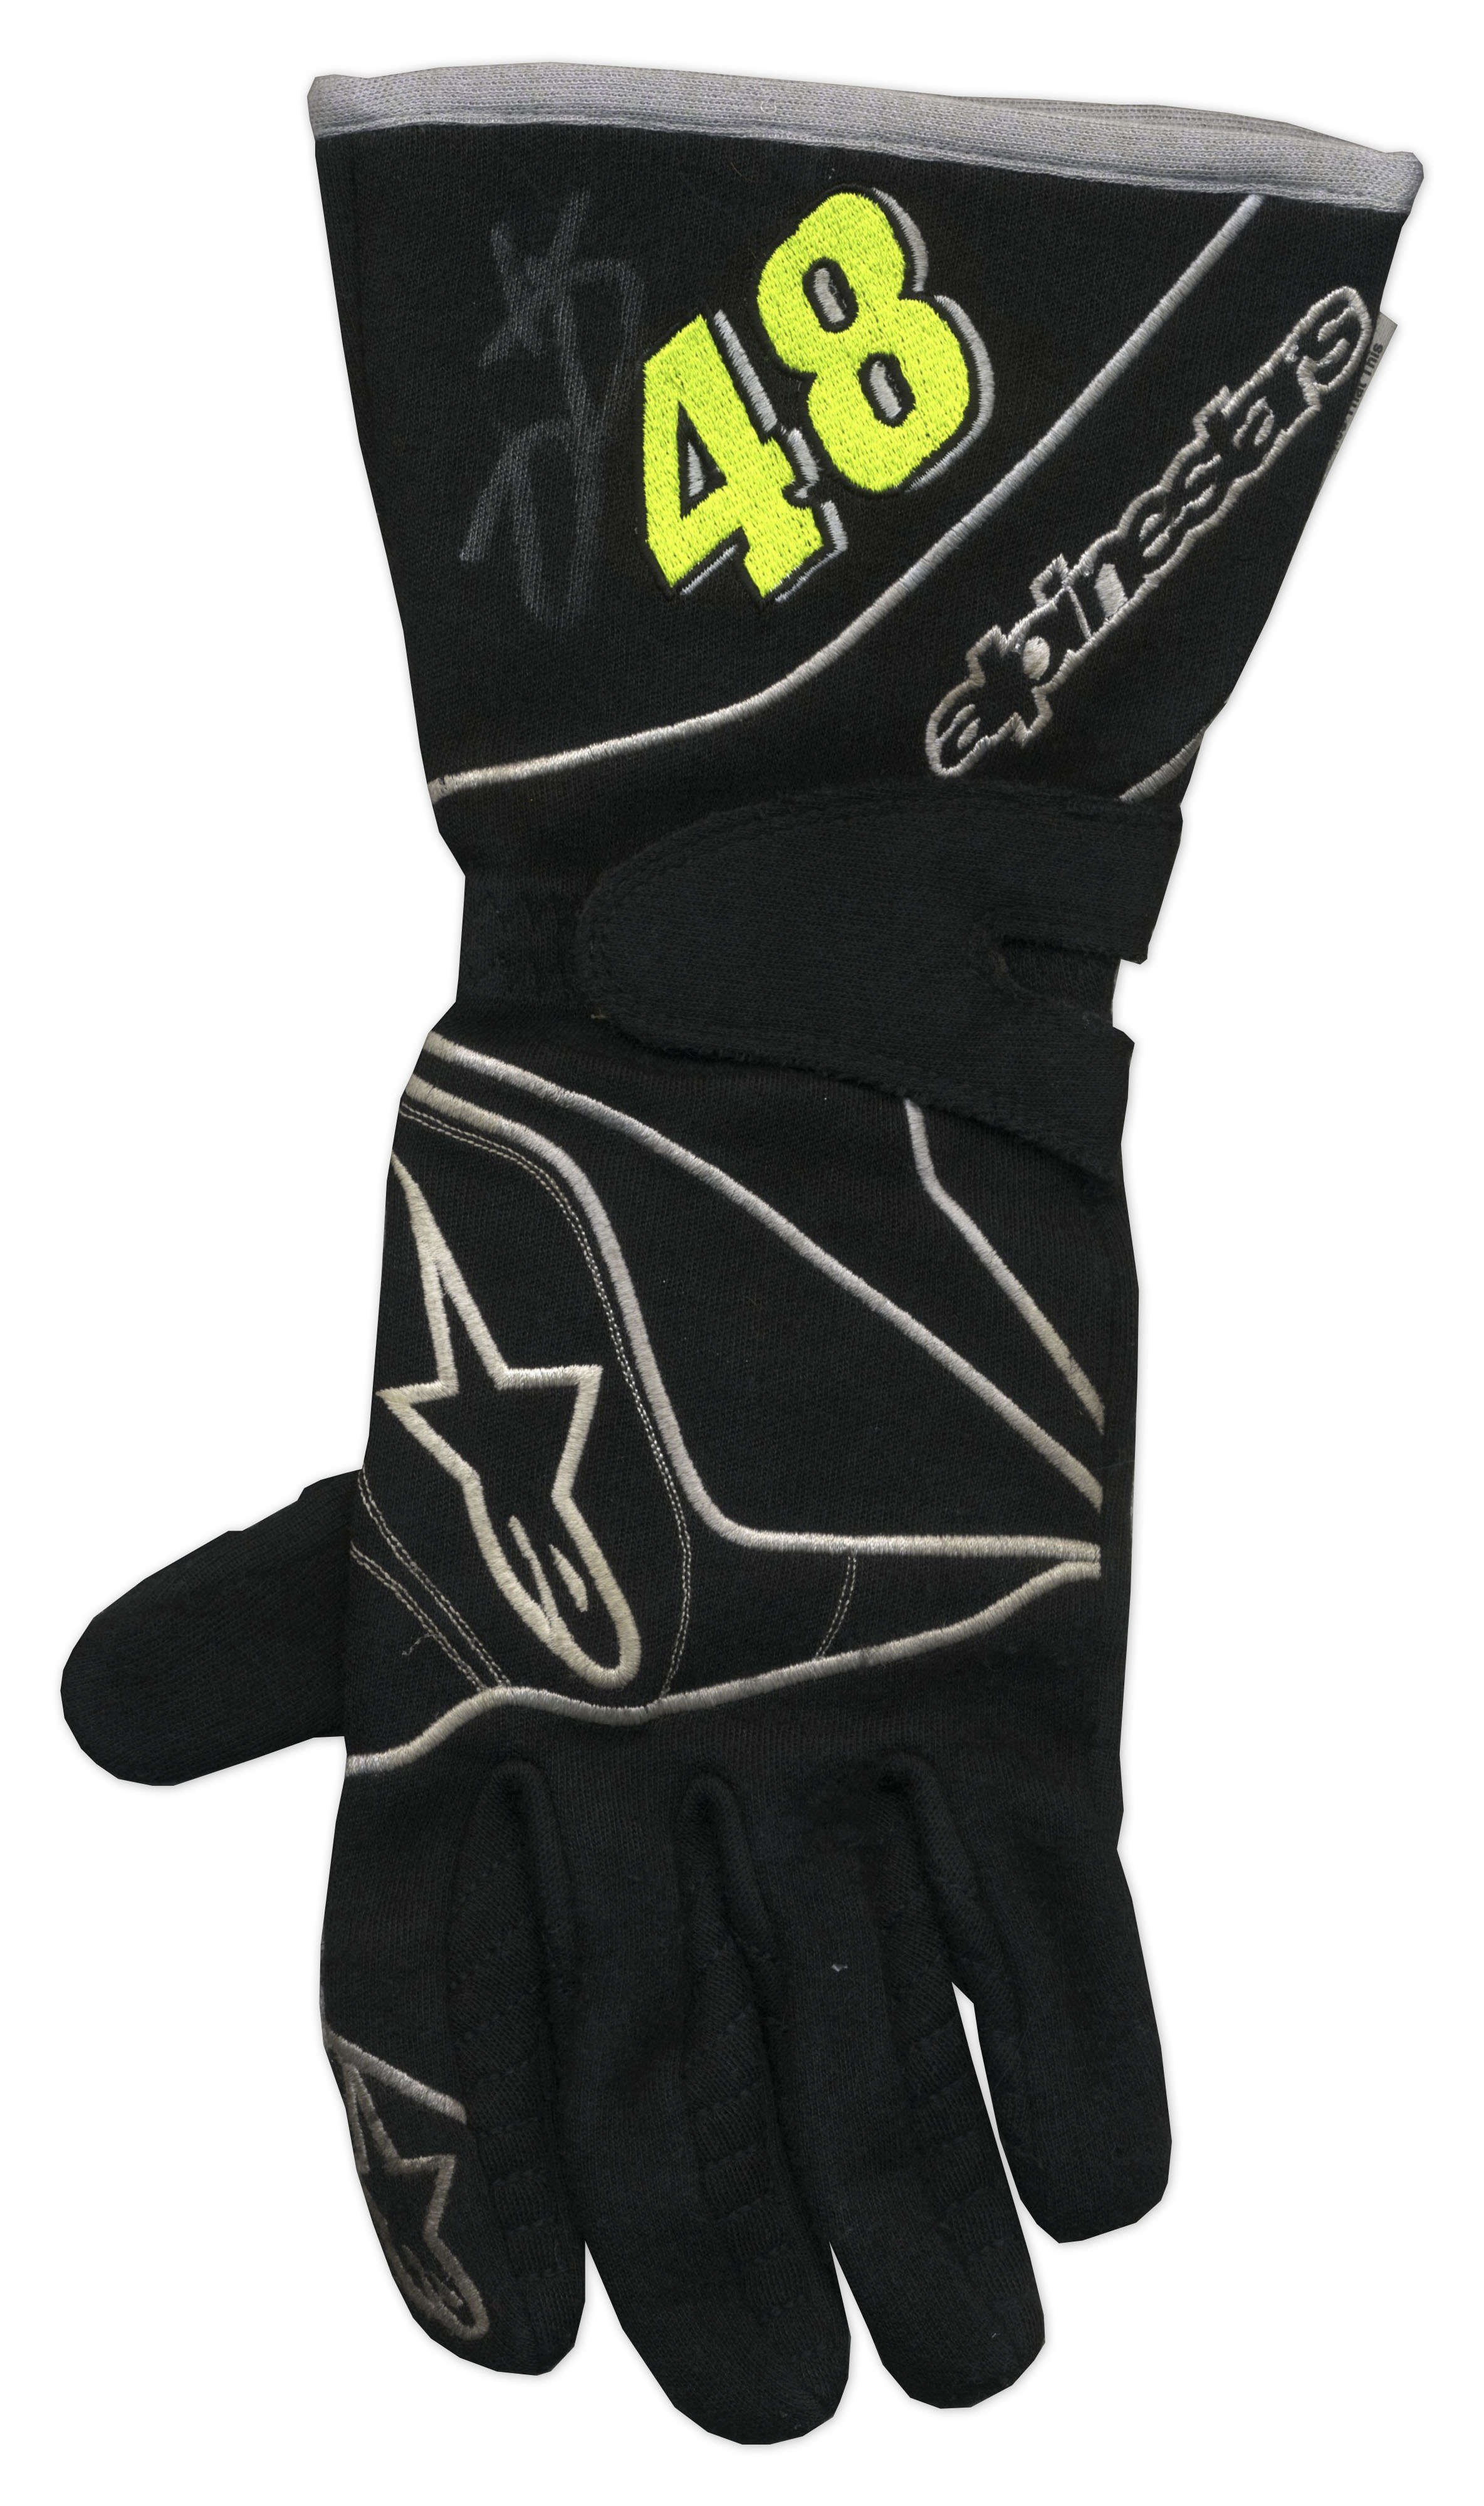 Driving gloves racing -  Jimmie Johnson Race Worn Signed Driving Gloves With Coa From Jimmie Johnson